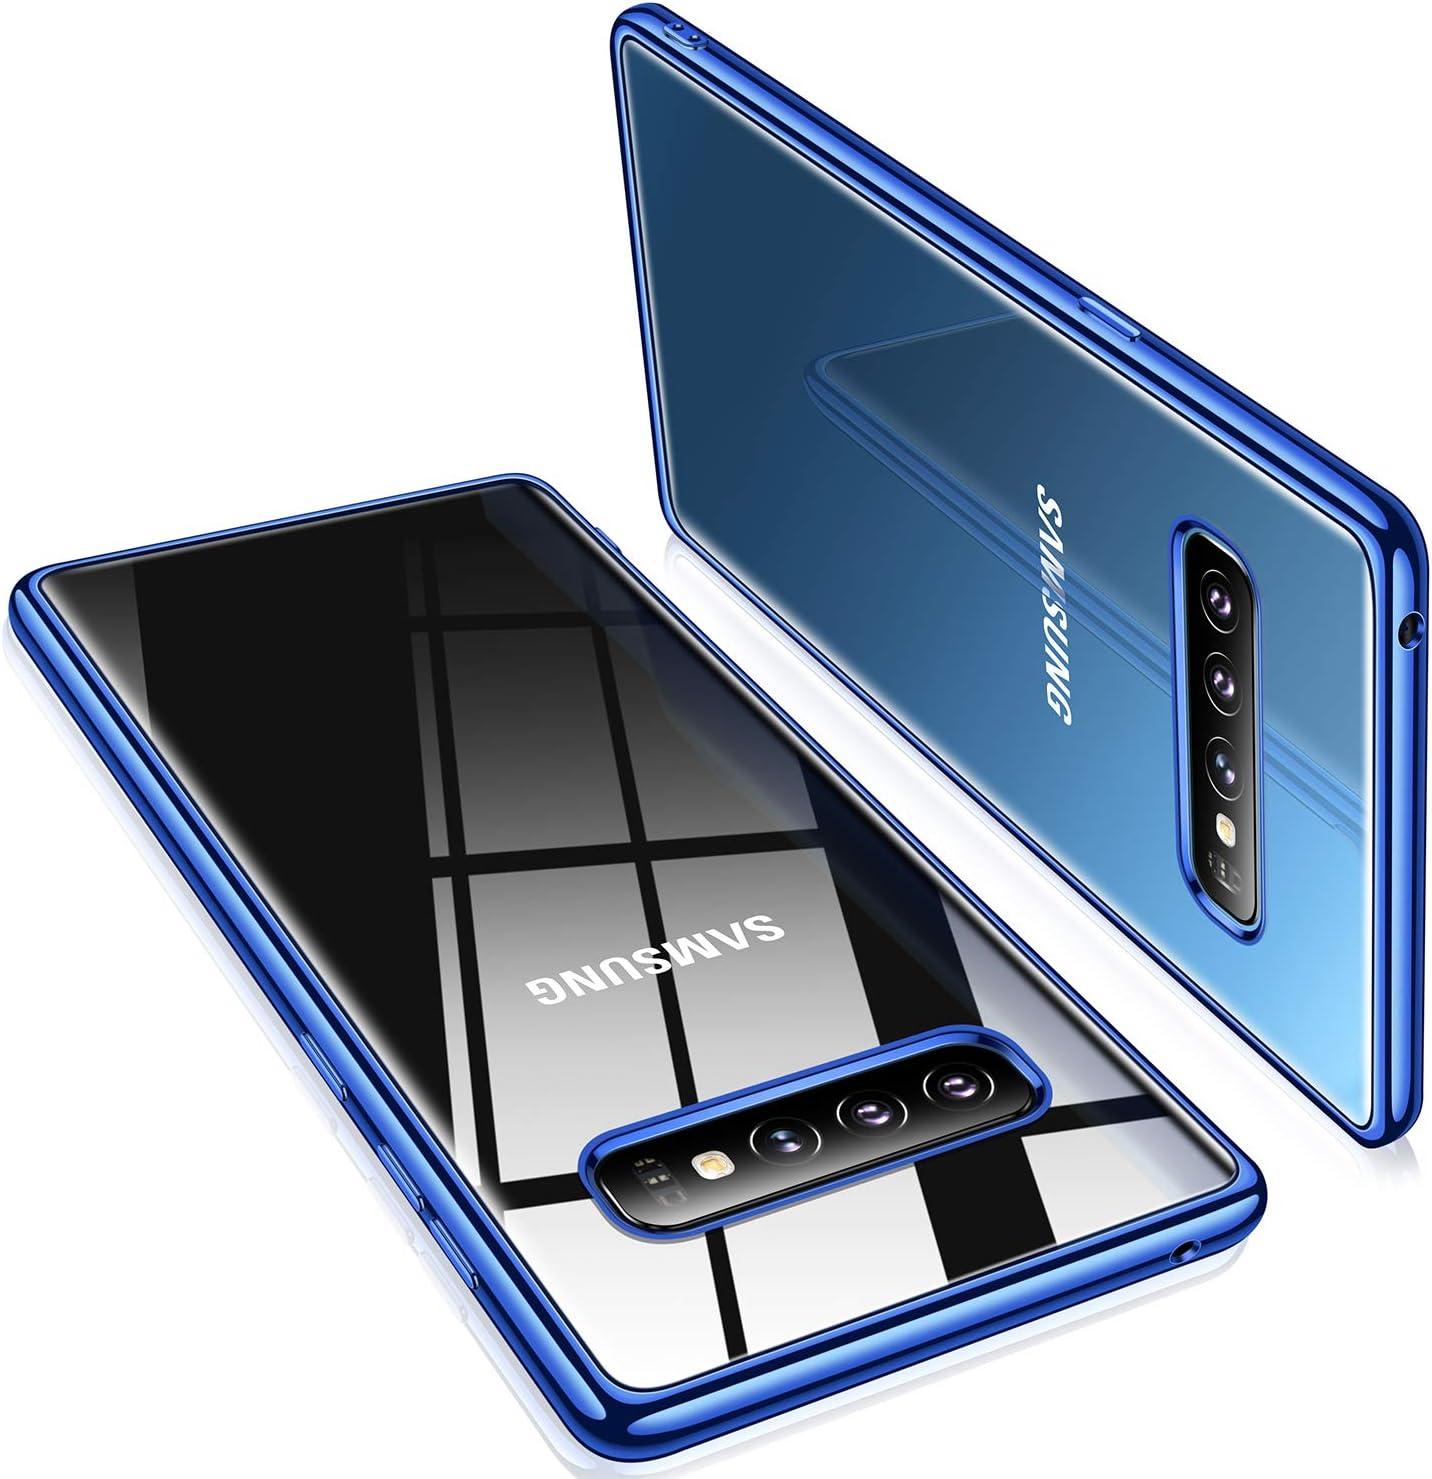 TORRAS Crystal Clear Galaxy S10+ Plus case 6.4 inch, Ultra-Thin Slim Fit Flashy Edge Case Soft TPU Cover for Galaxy S10 Plus, Glossy Blue